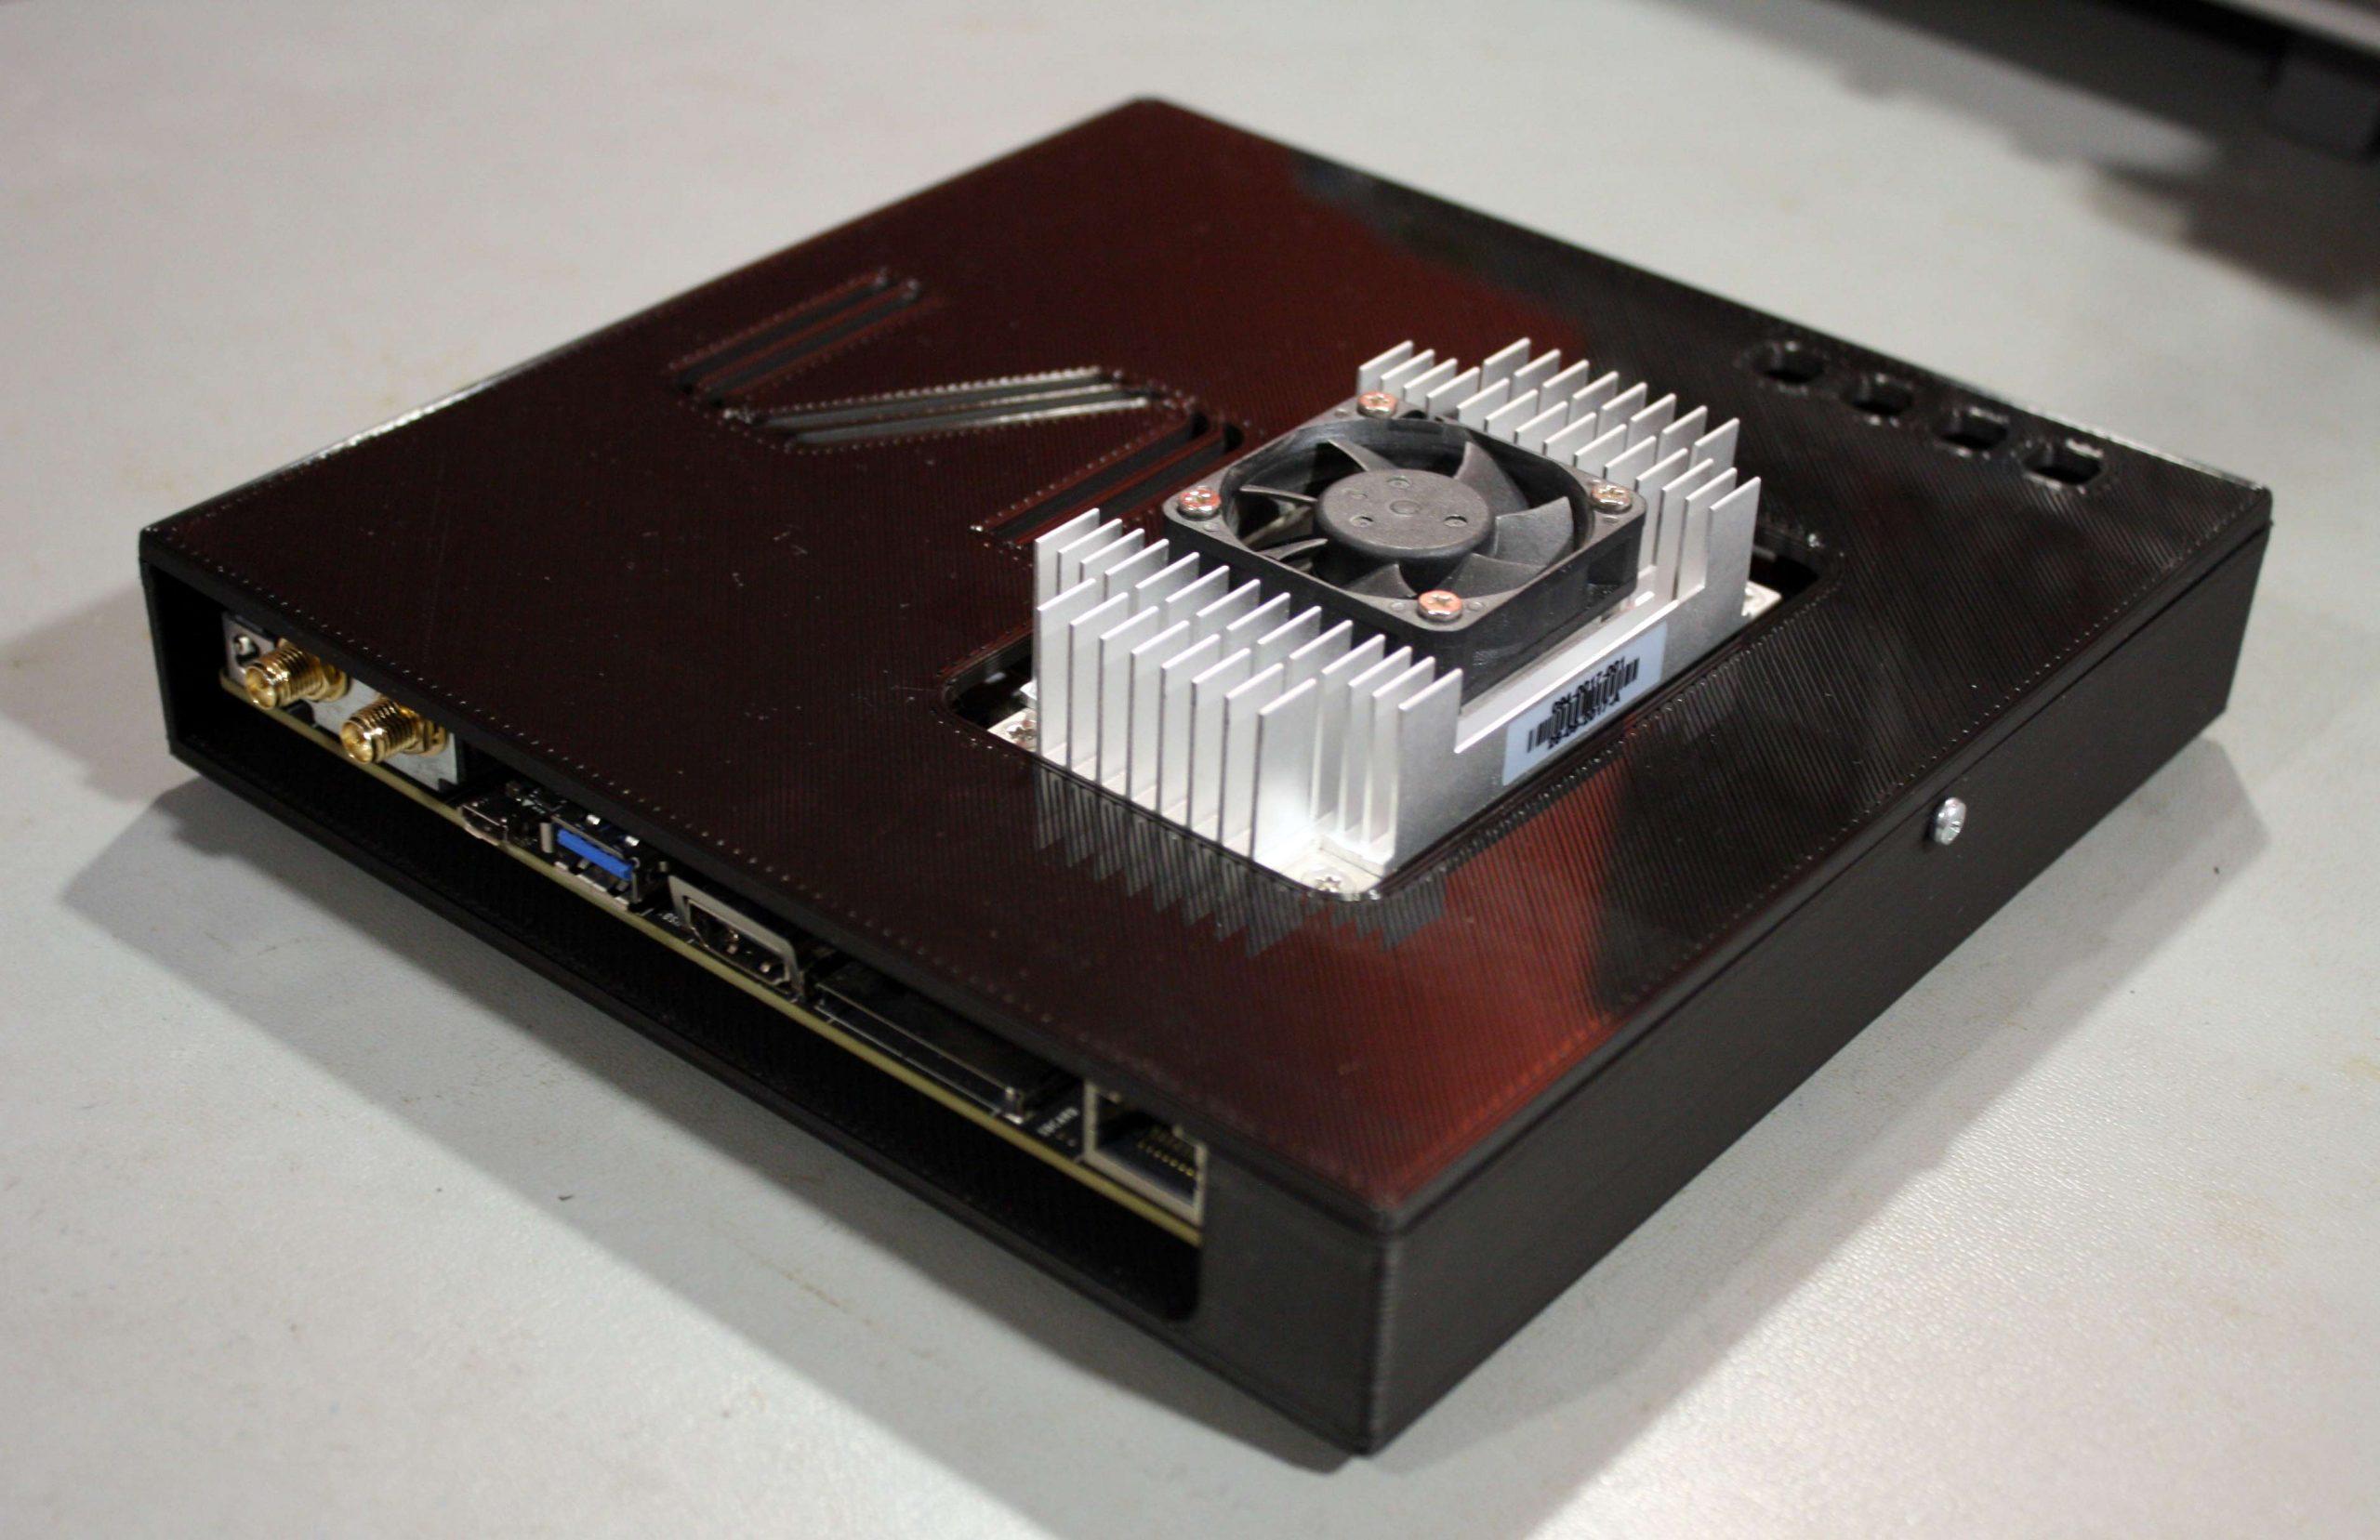 NVidia Jetson Developer Kit casing